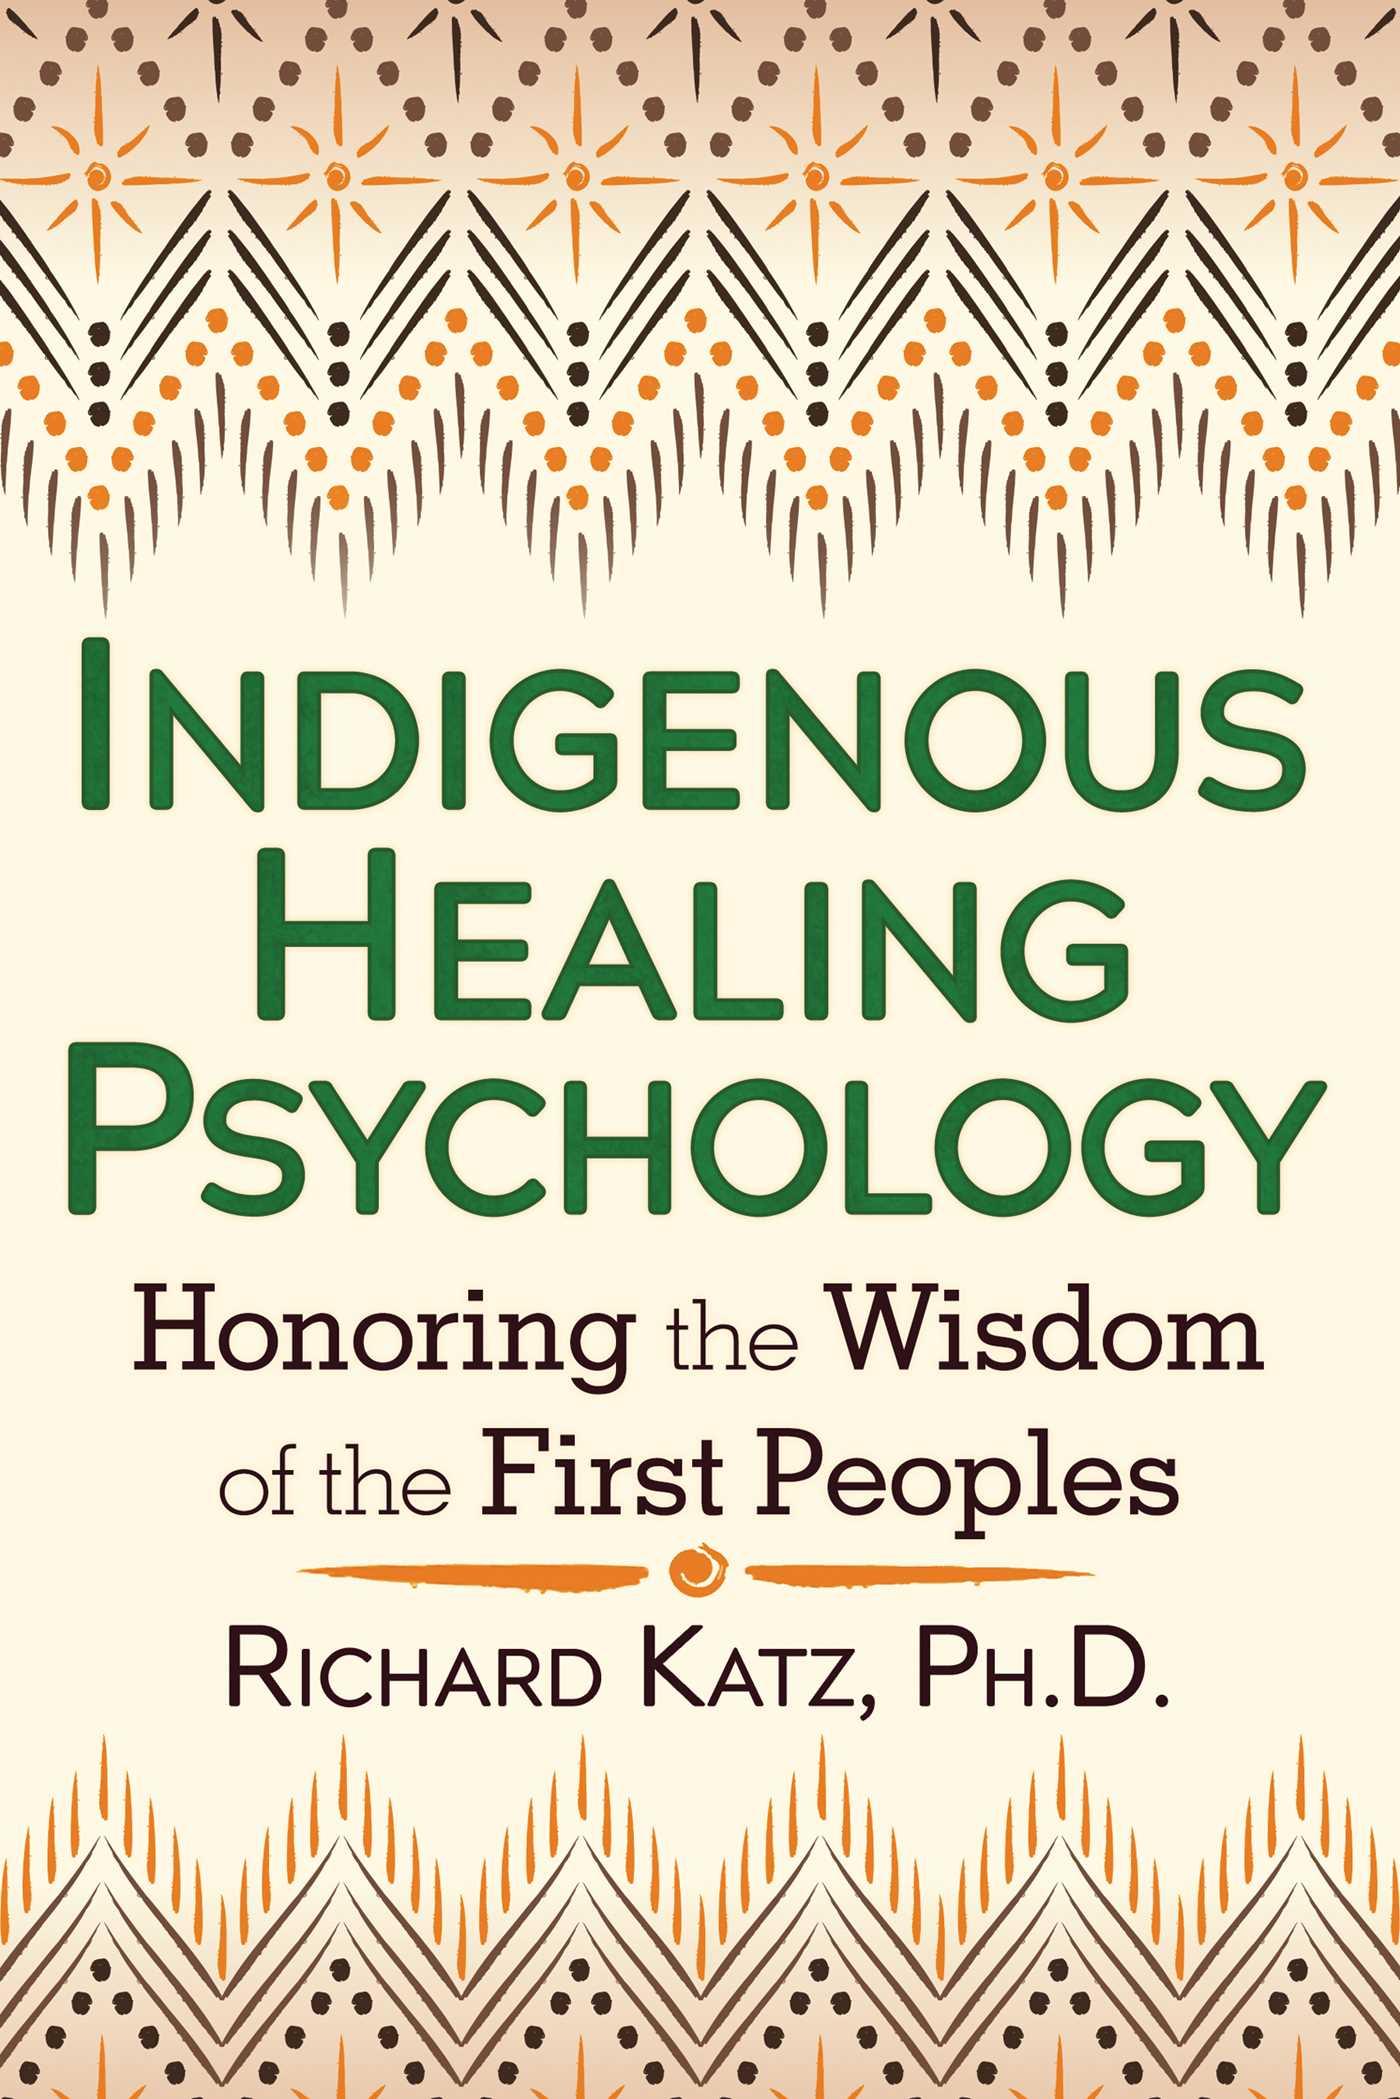 Indigenous healing psychology 9781620552681 hr